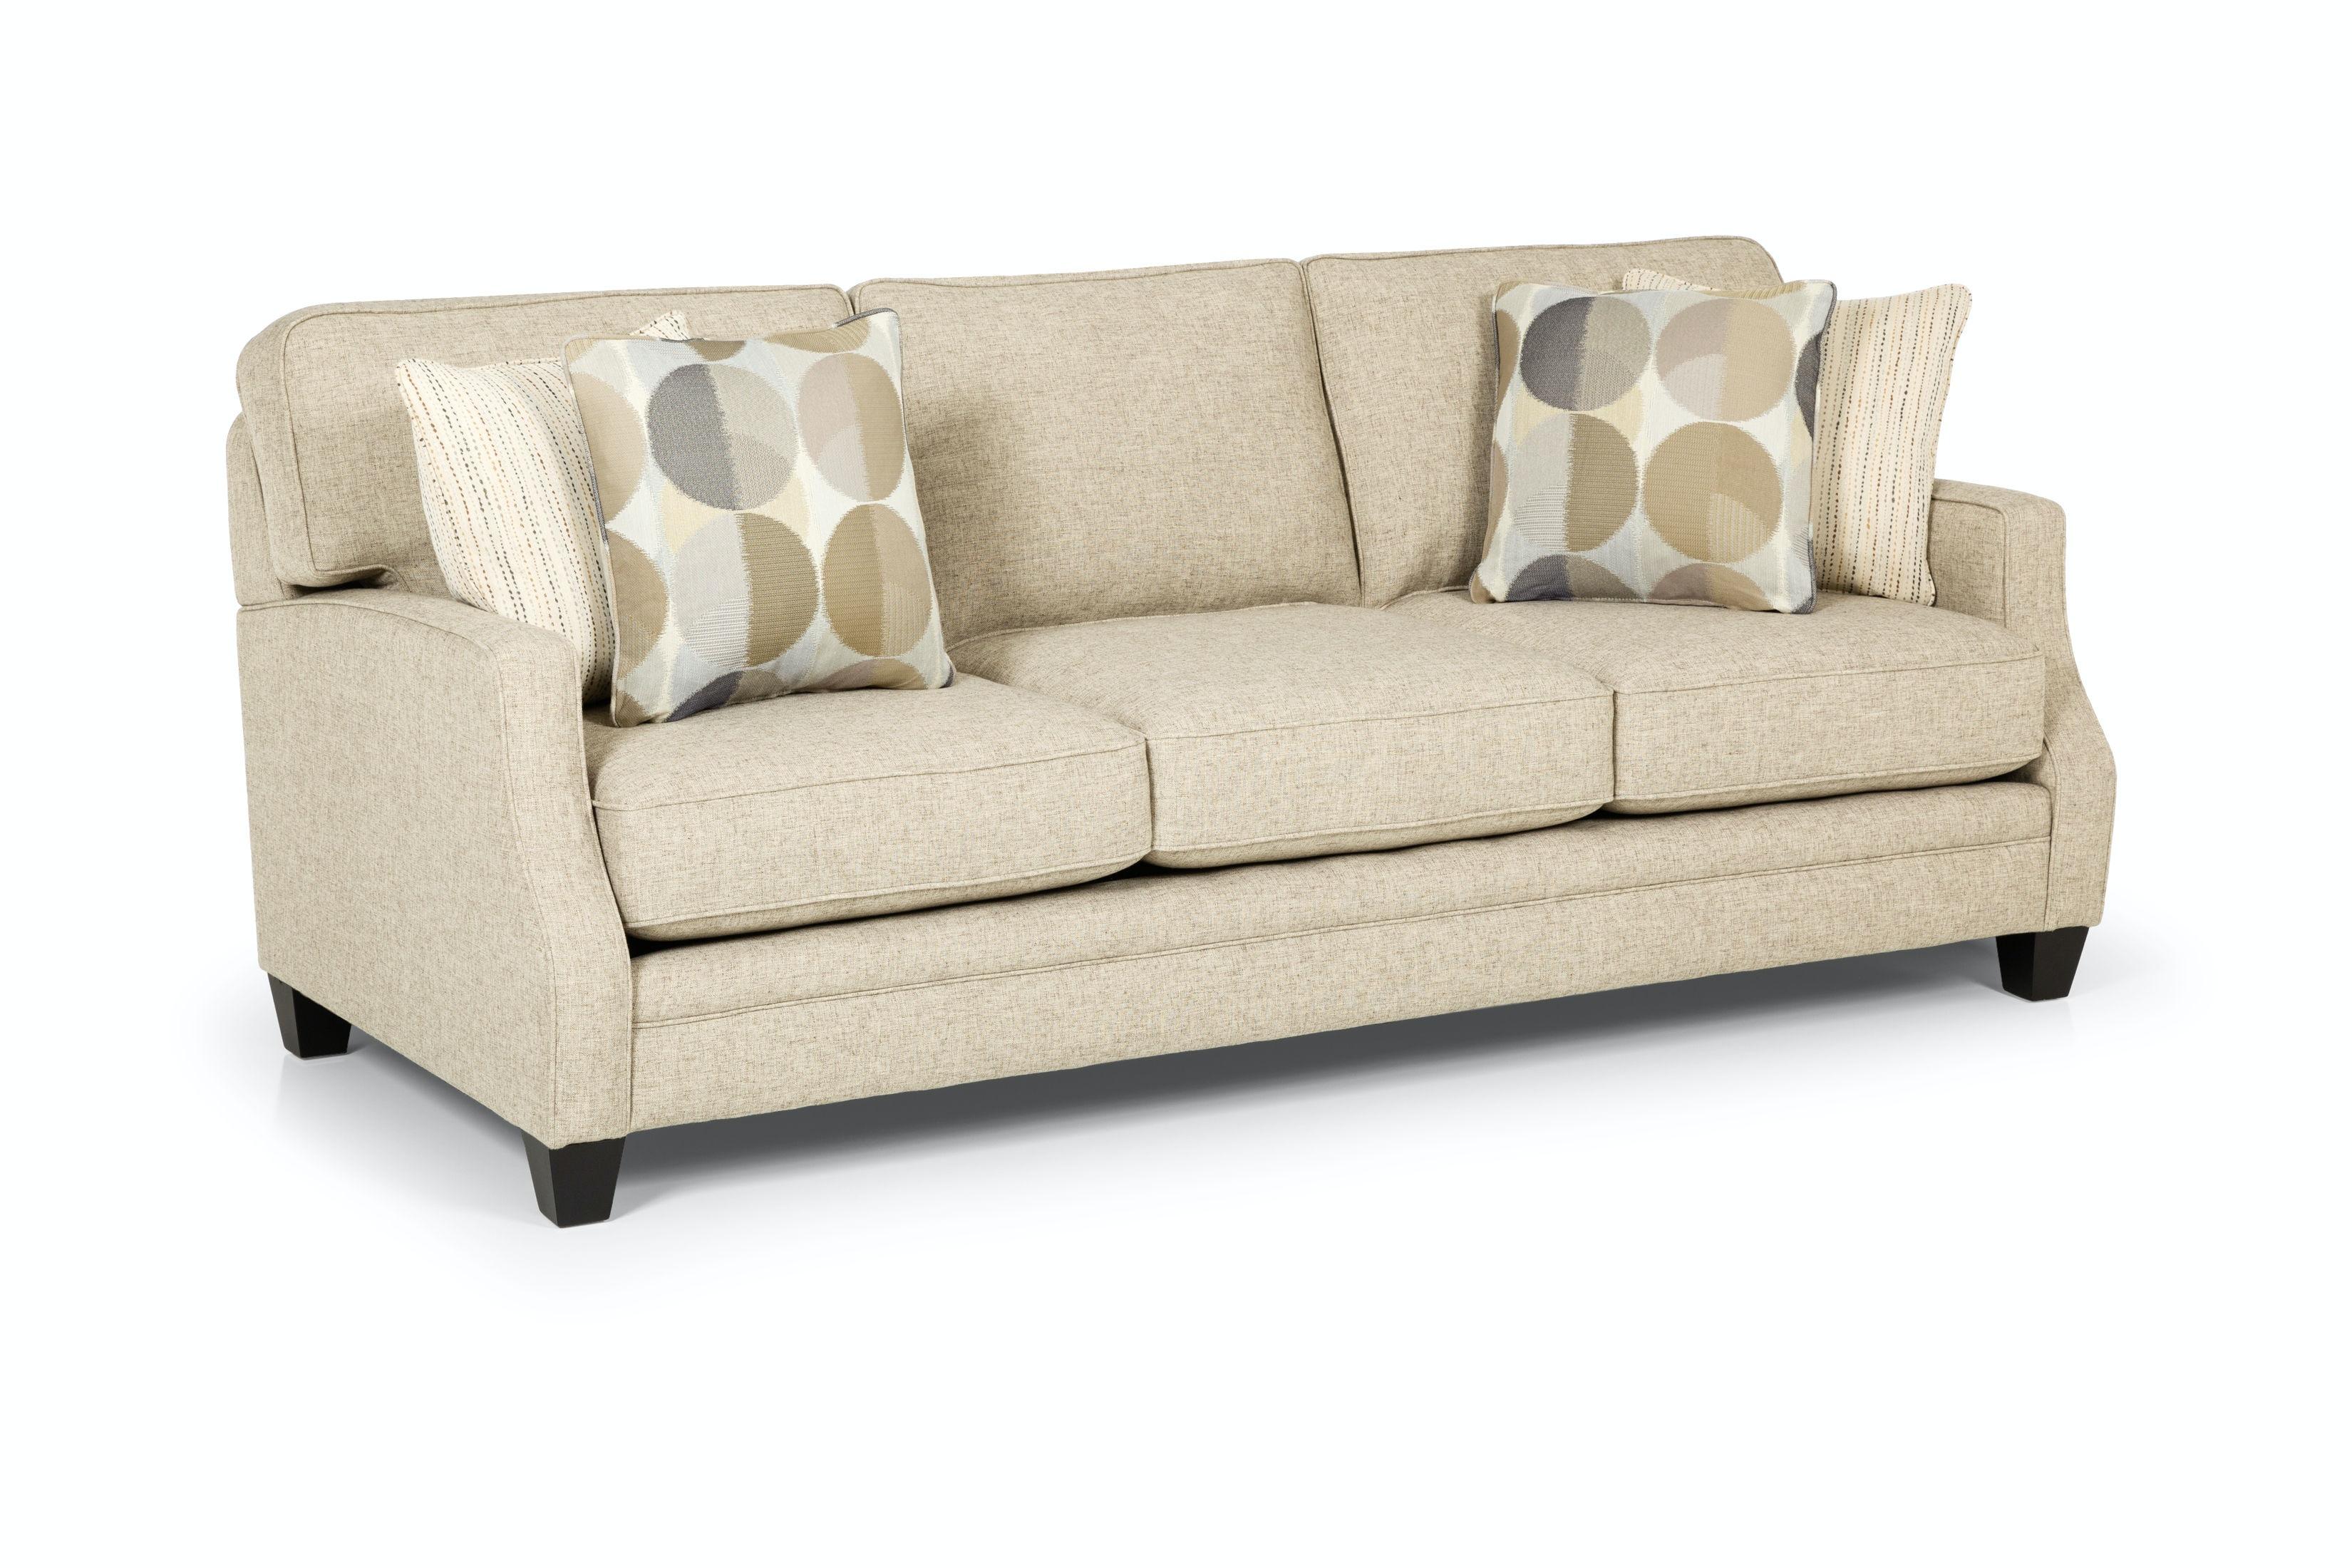 Stanton Furniture Sofa 35801 In Portland, Oregon